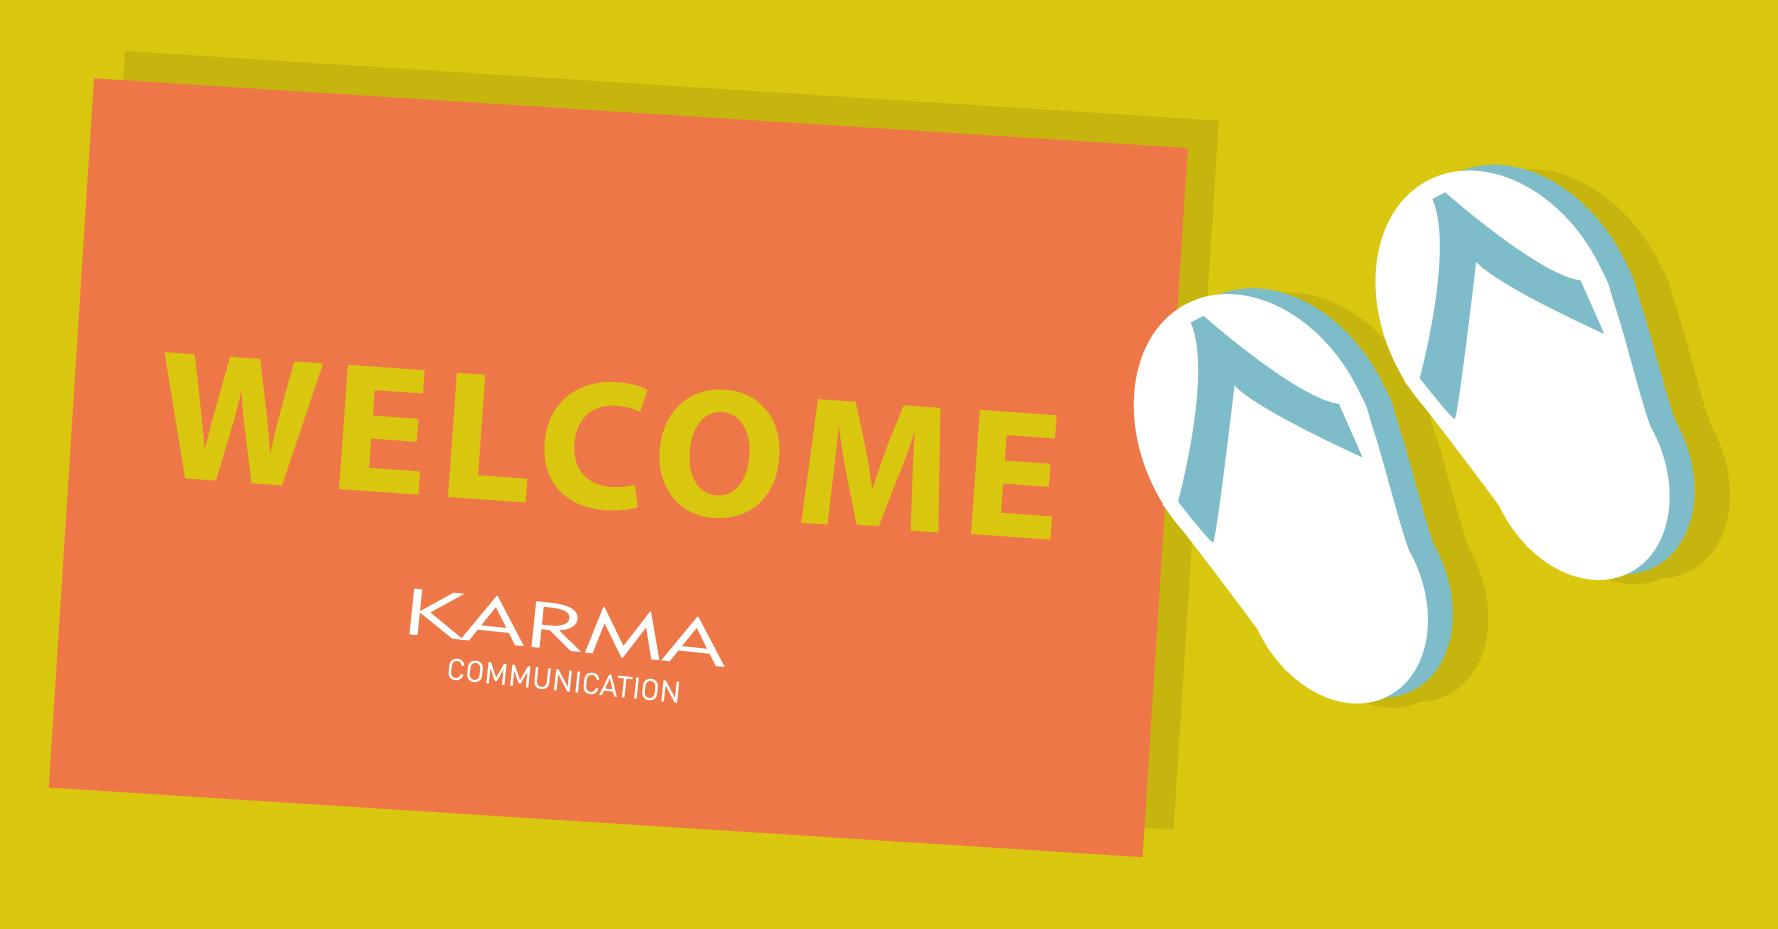 Karma Communication - Benvenuto Giugno